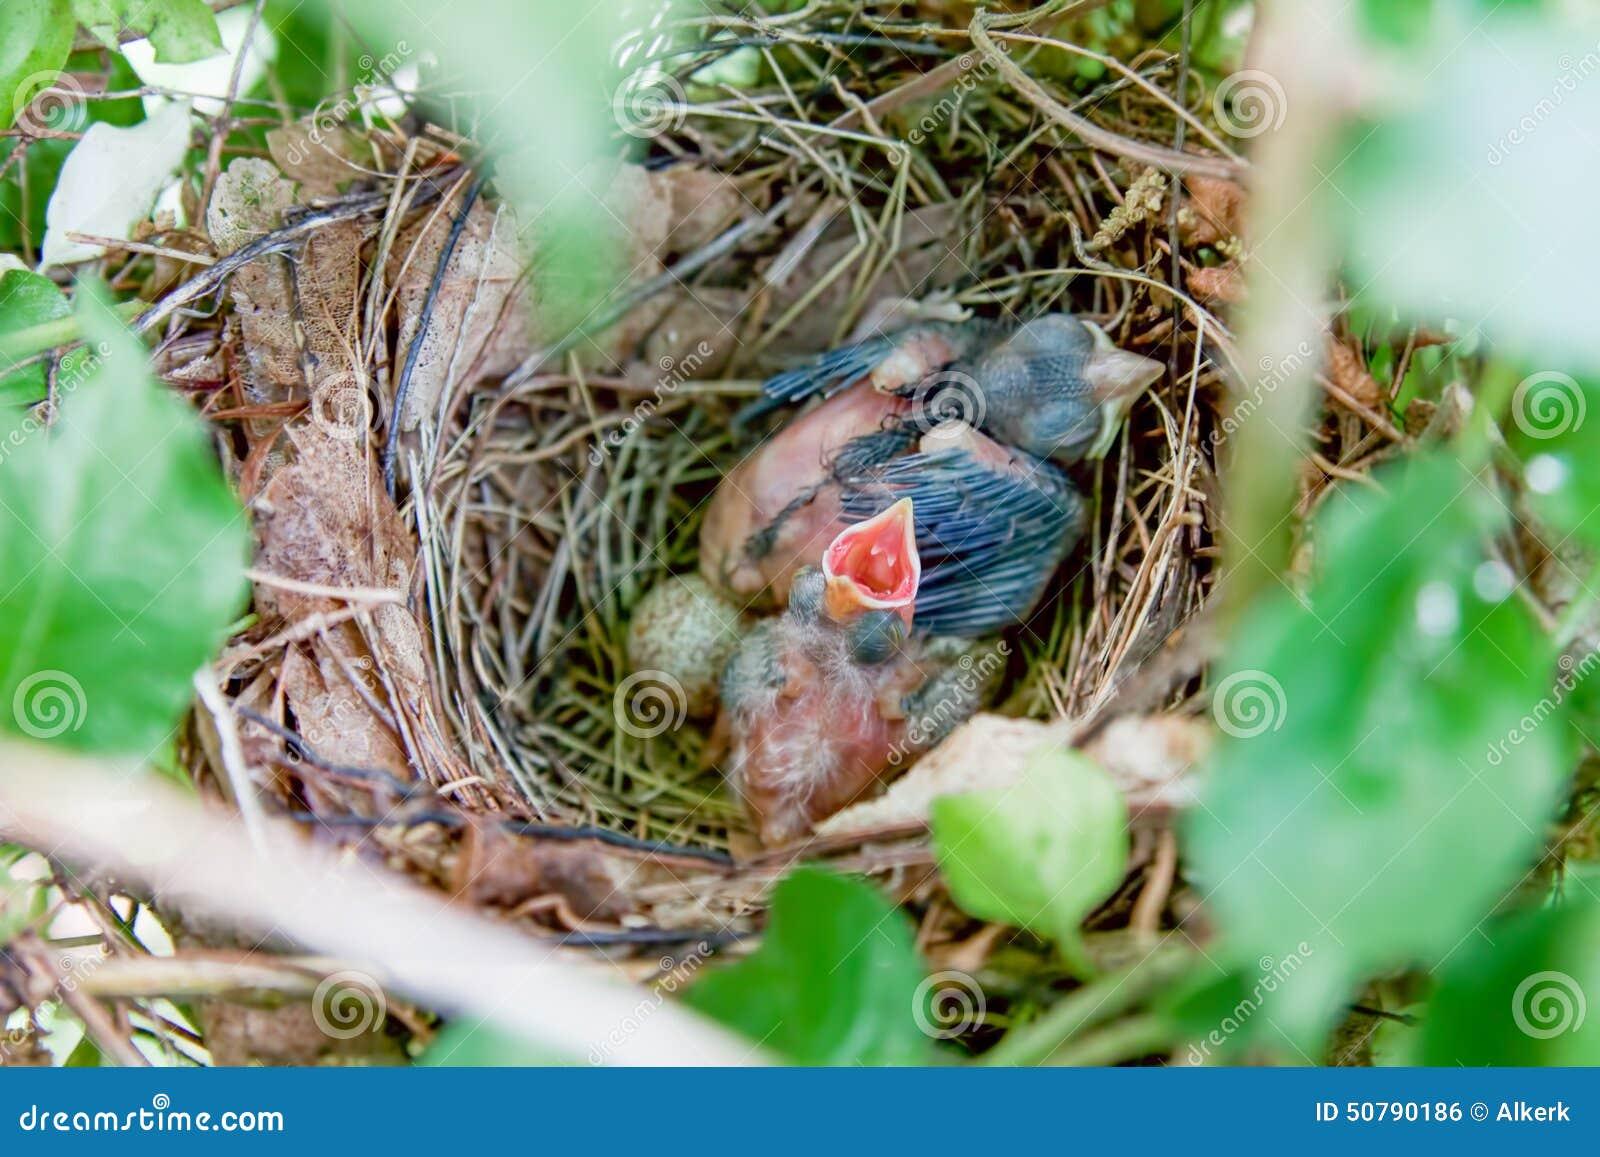 Baby Bird Egg Food